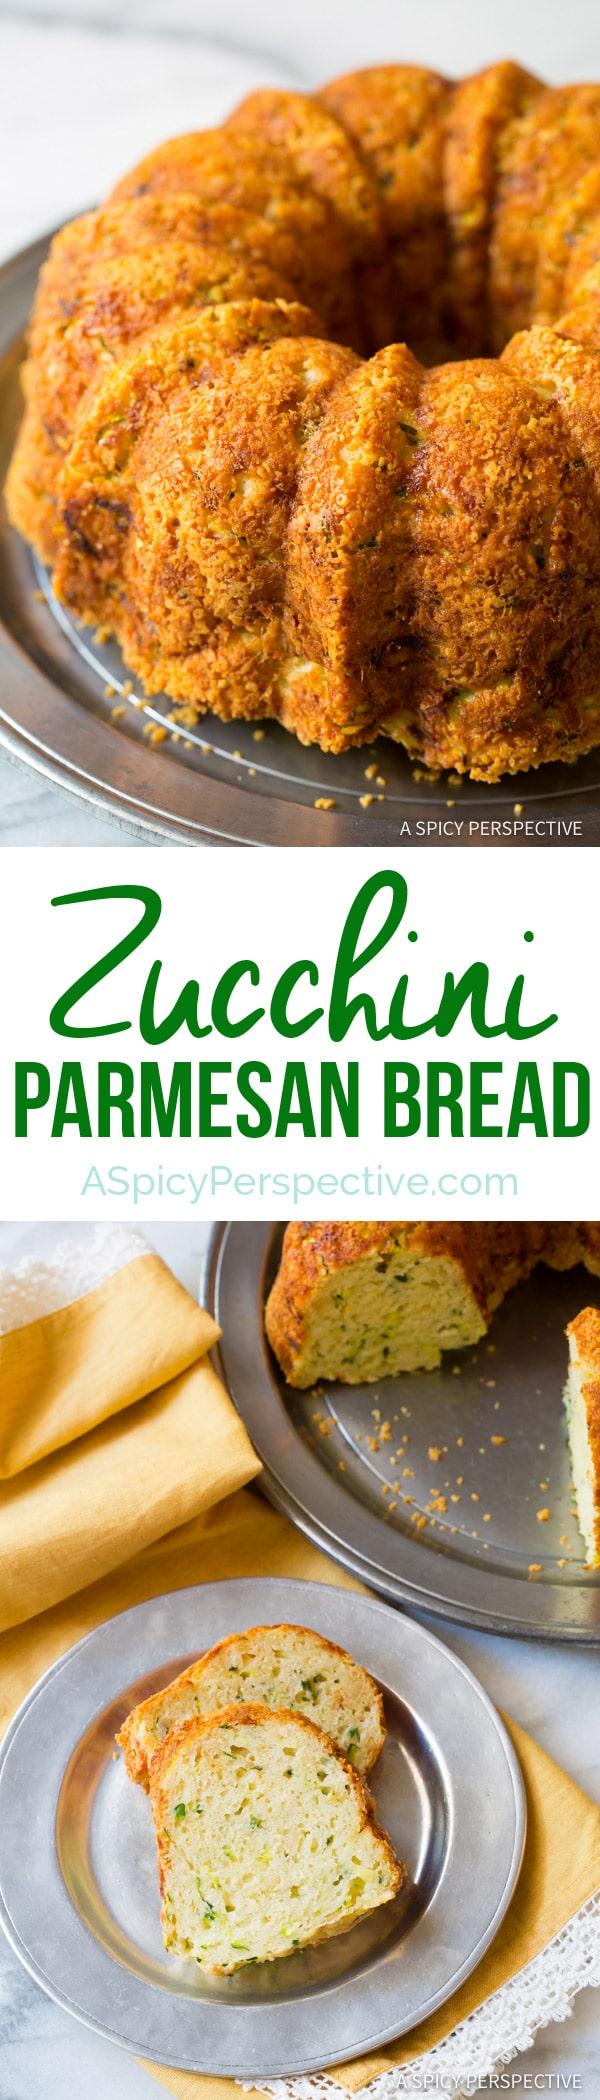 Zesty Zucchini Parmesan Bread | ASpicyPerspective.com